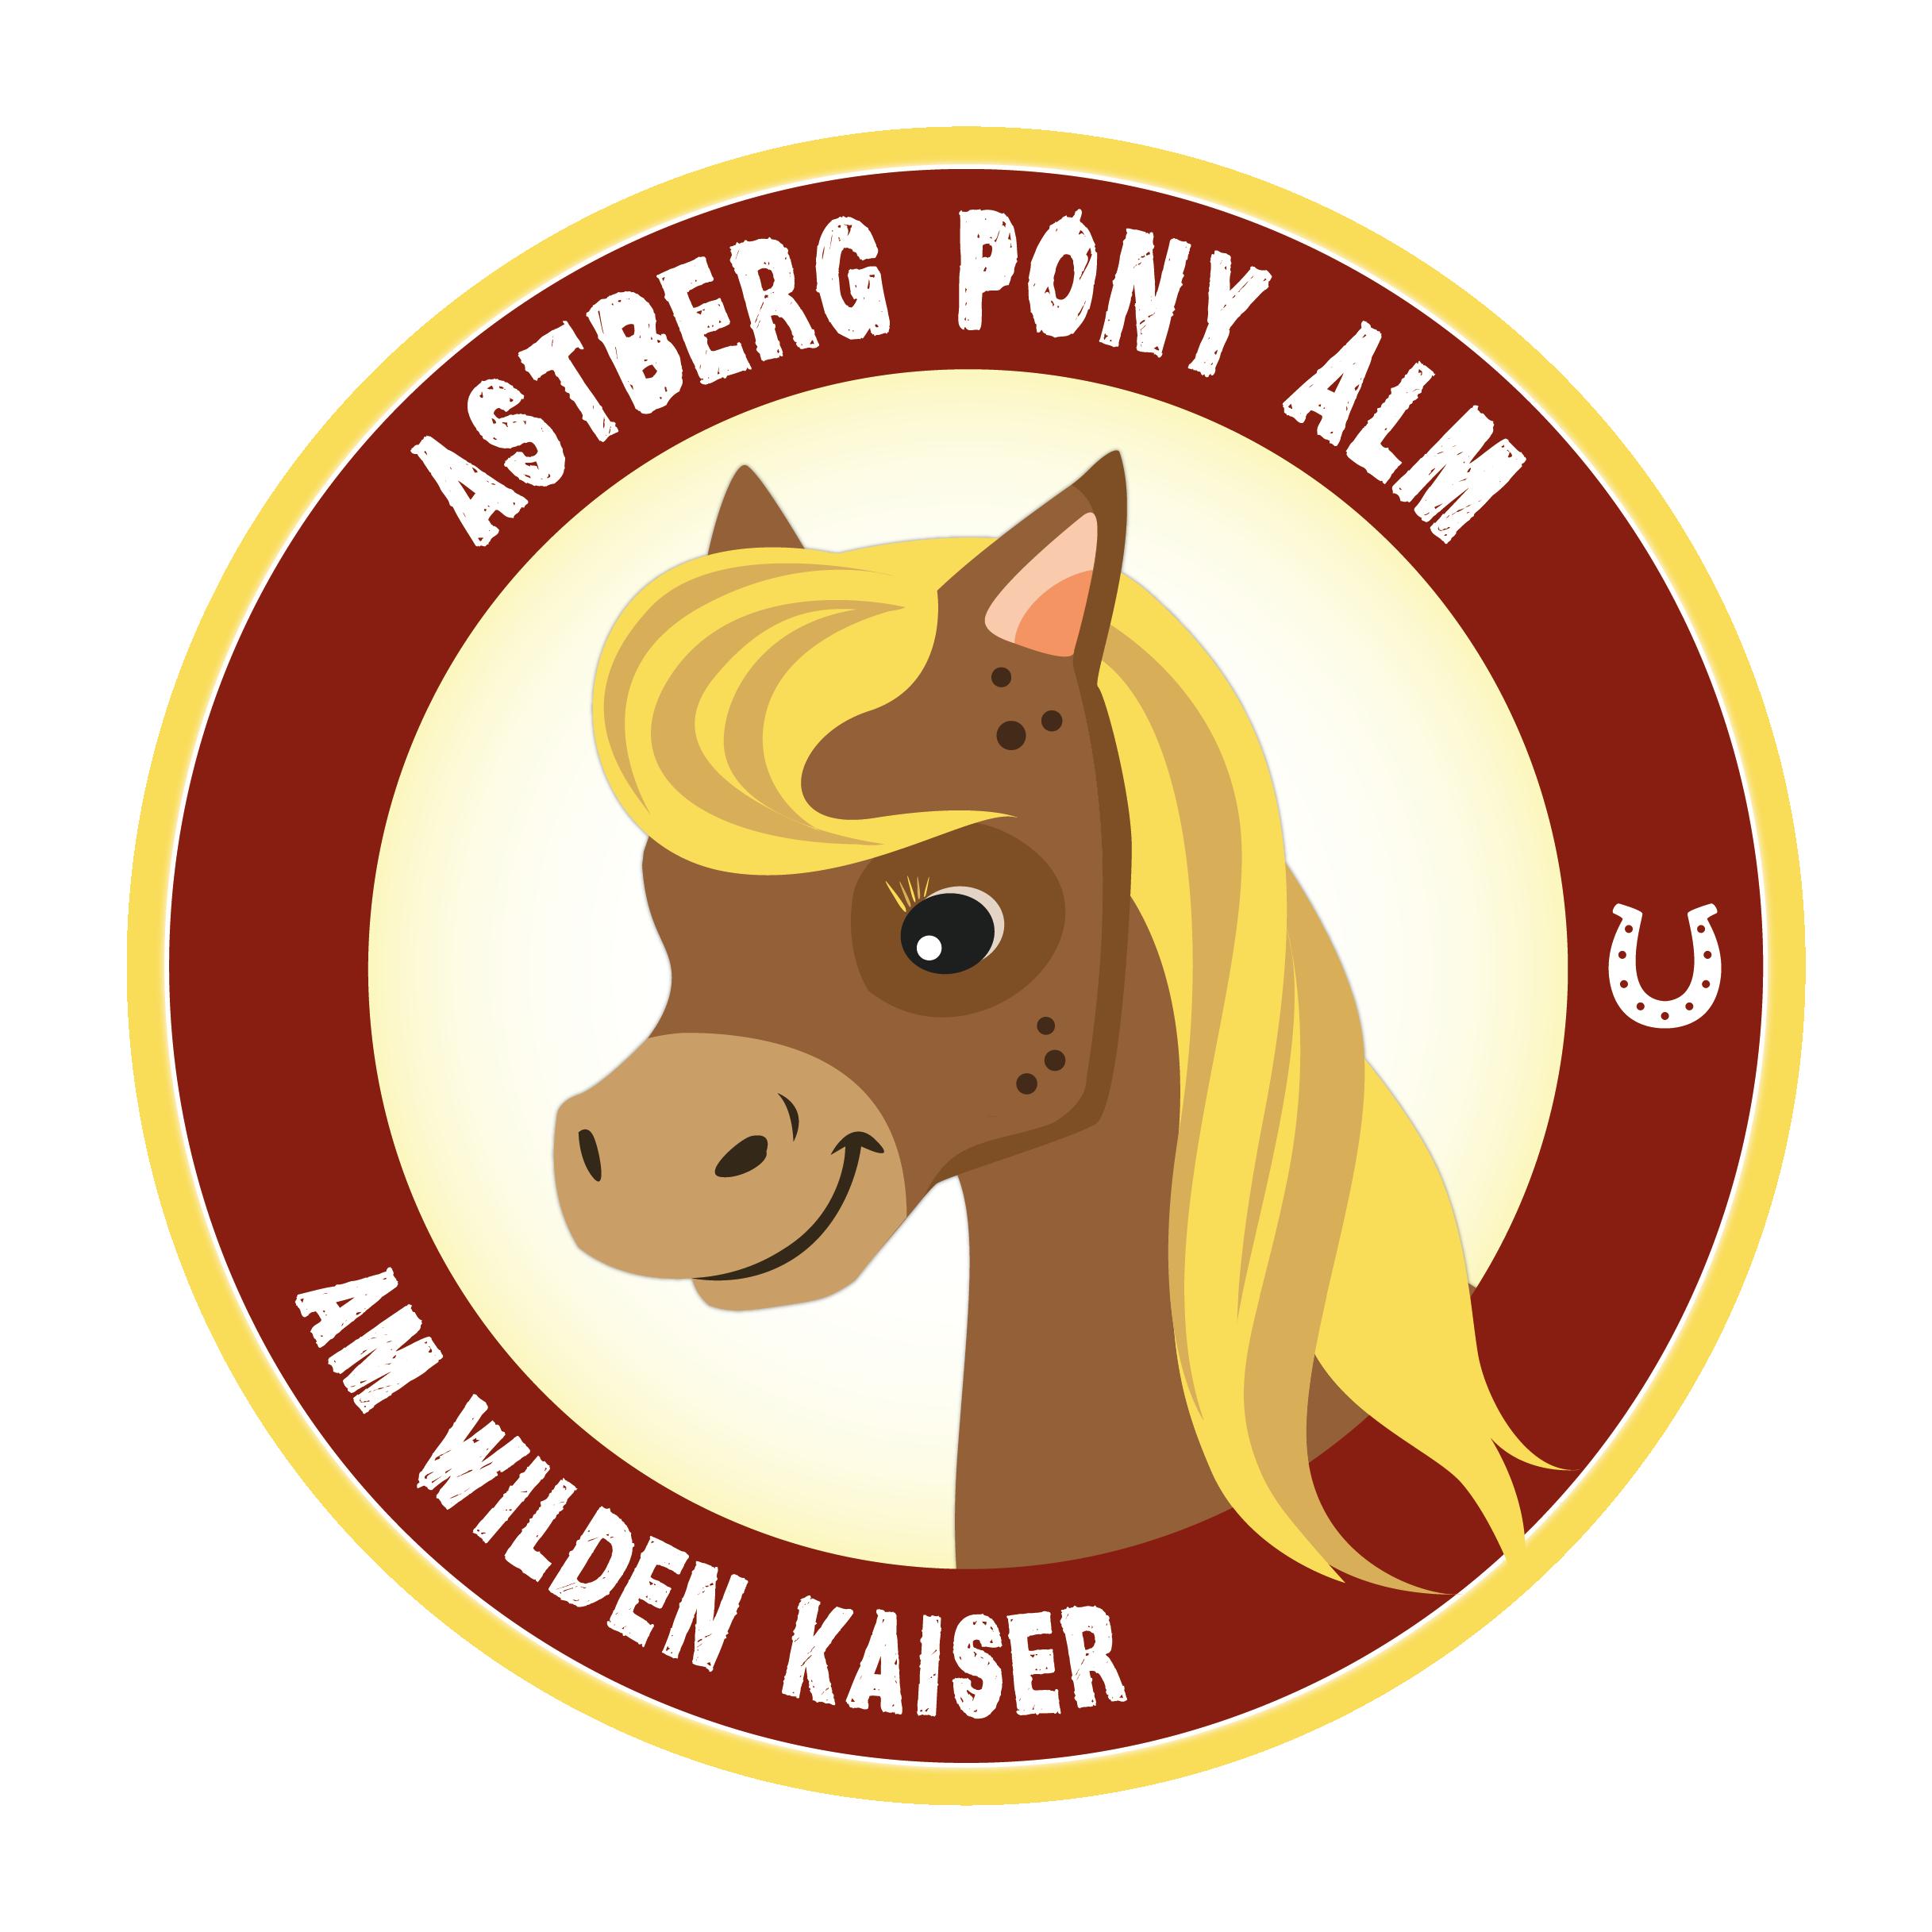 Astberg Pony Alm